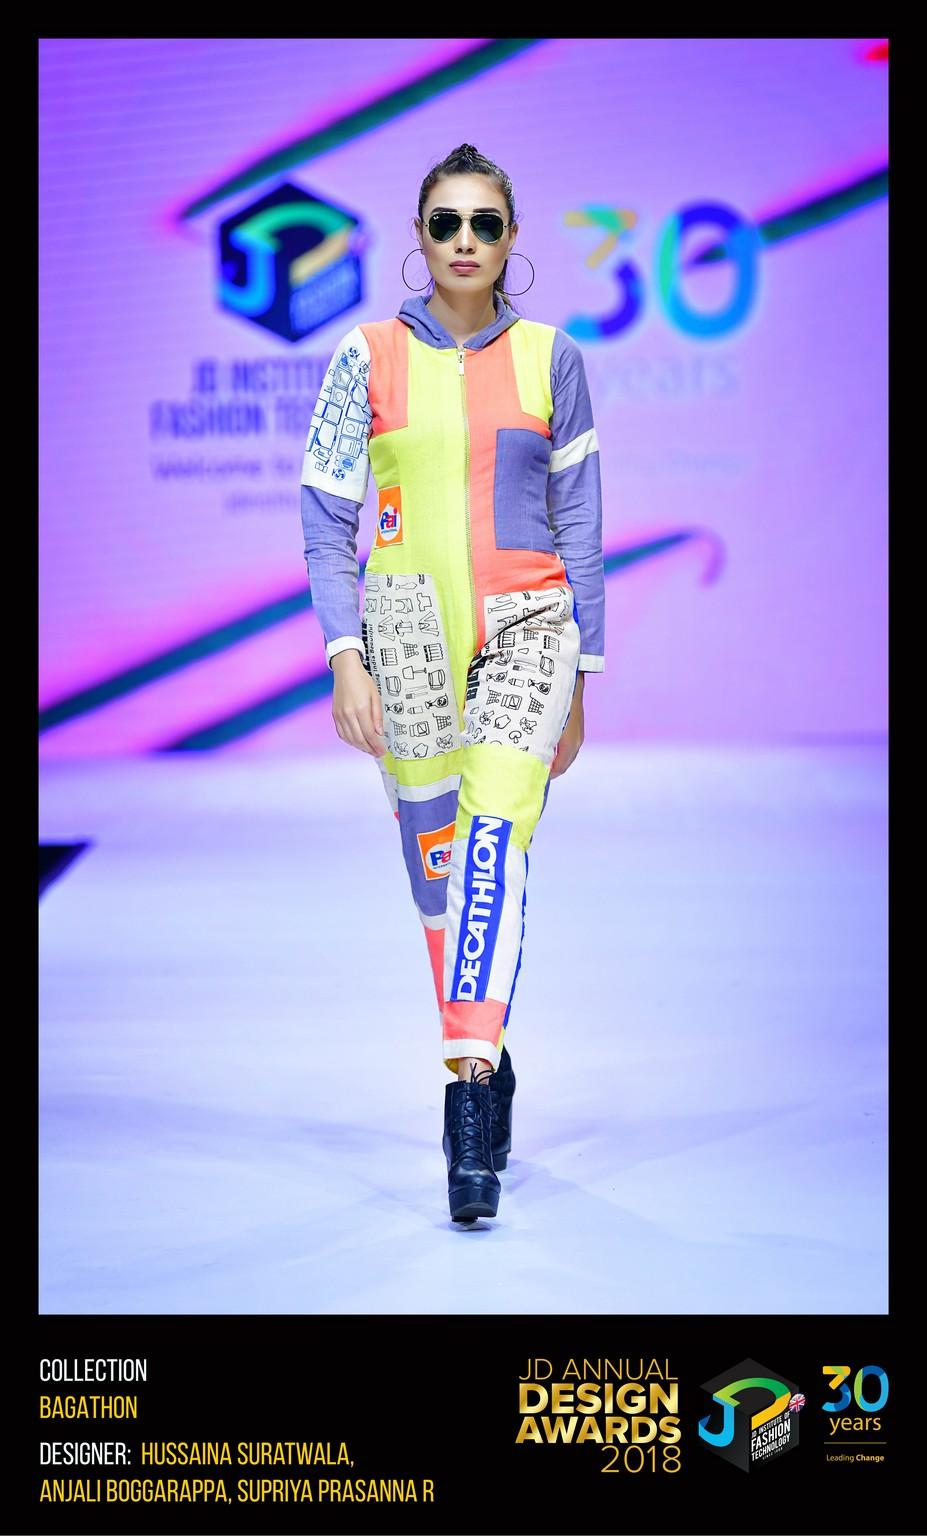 Bagathon – Change – JD Annual Design Awards 2018 | Designer: Supriya, Anjali and Hussaina | Photography : Jerin Nath (@jerin_nath) bagathon – change – jd annual design awards 2018 - BAGATHON 6 - Bagathon – Change – JD Annual Design Awards 2018